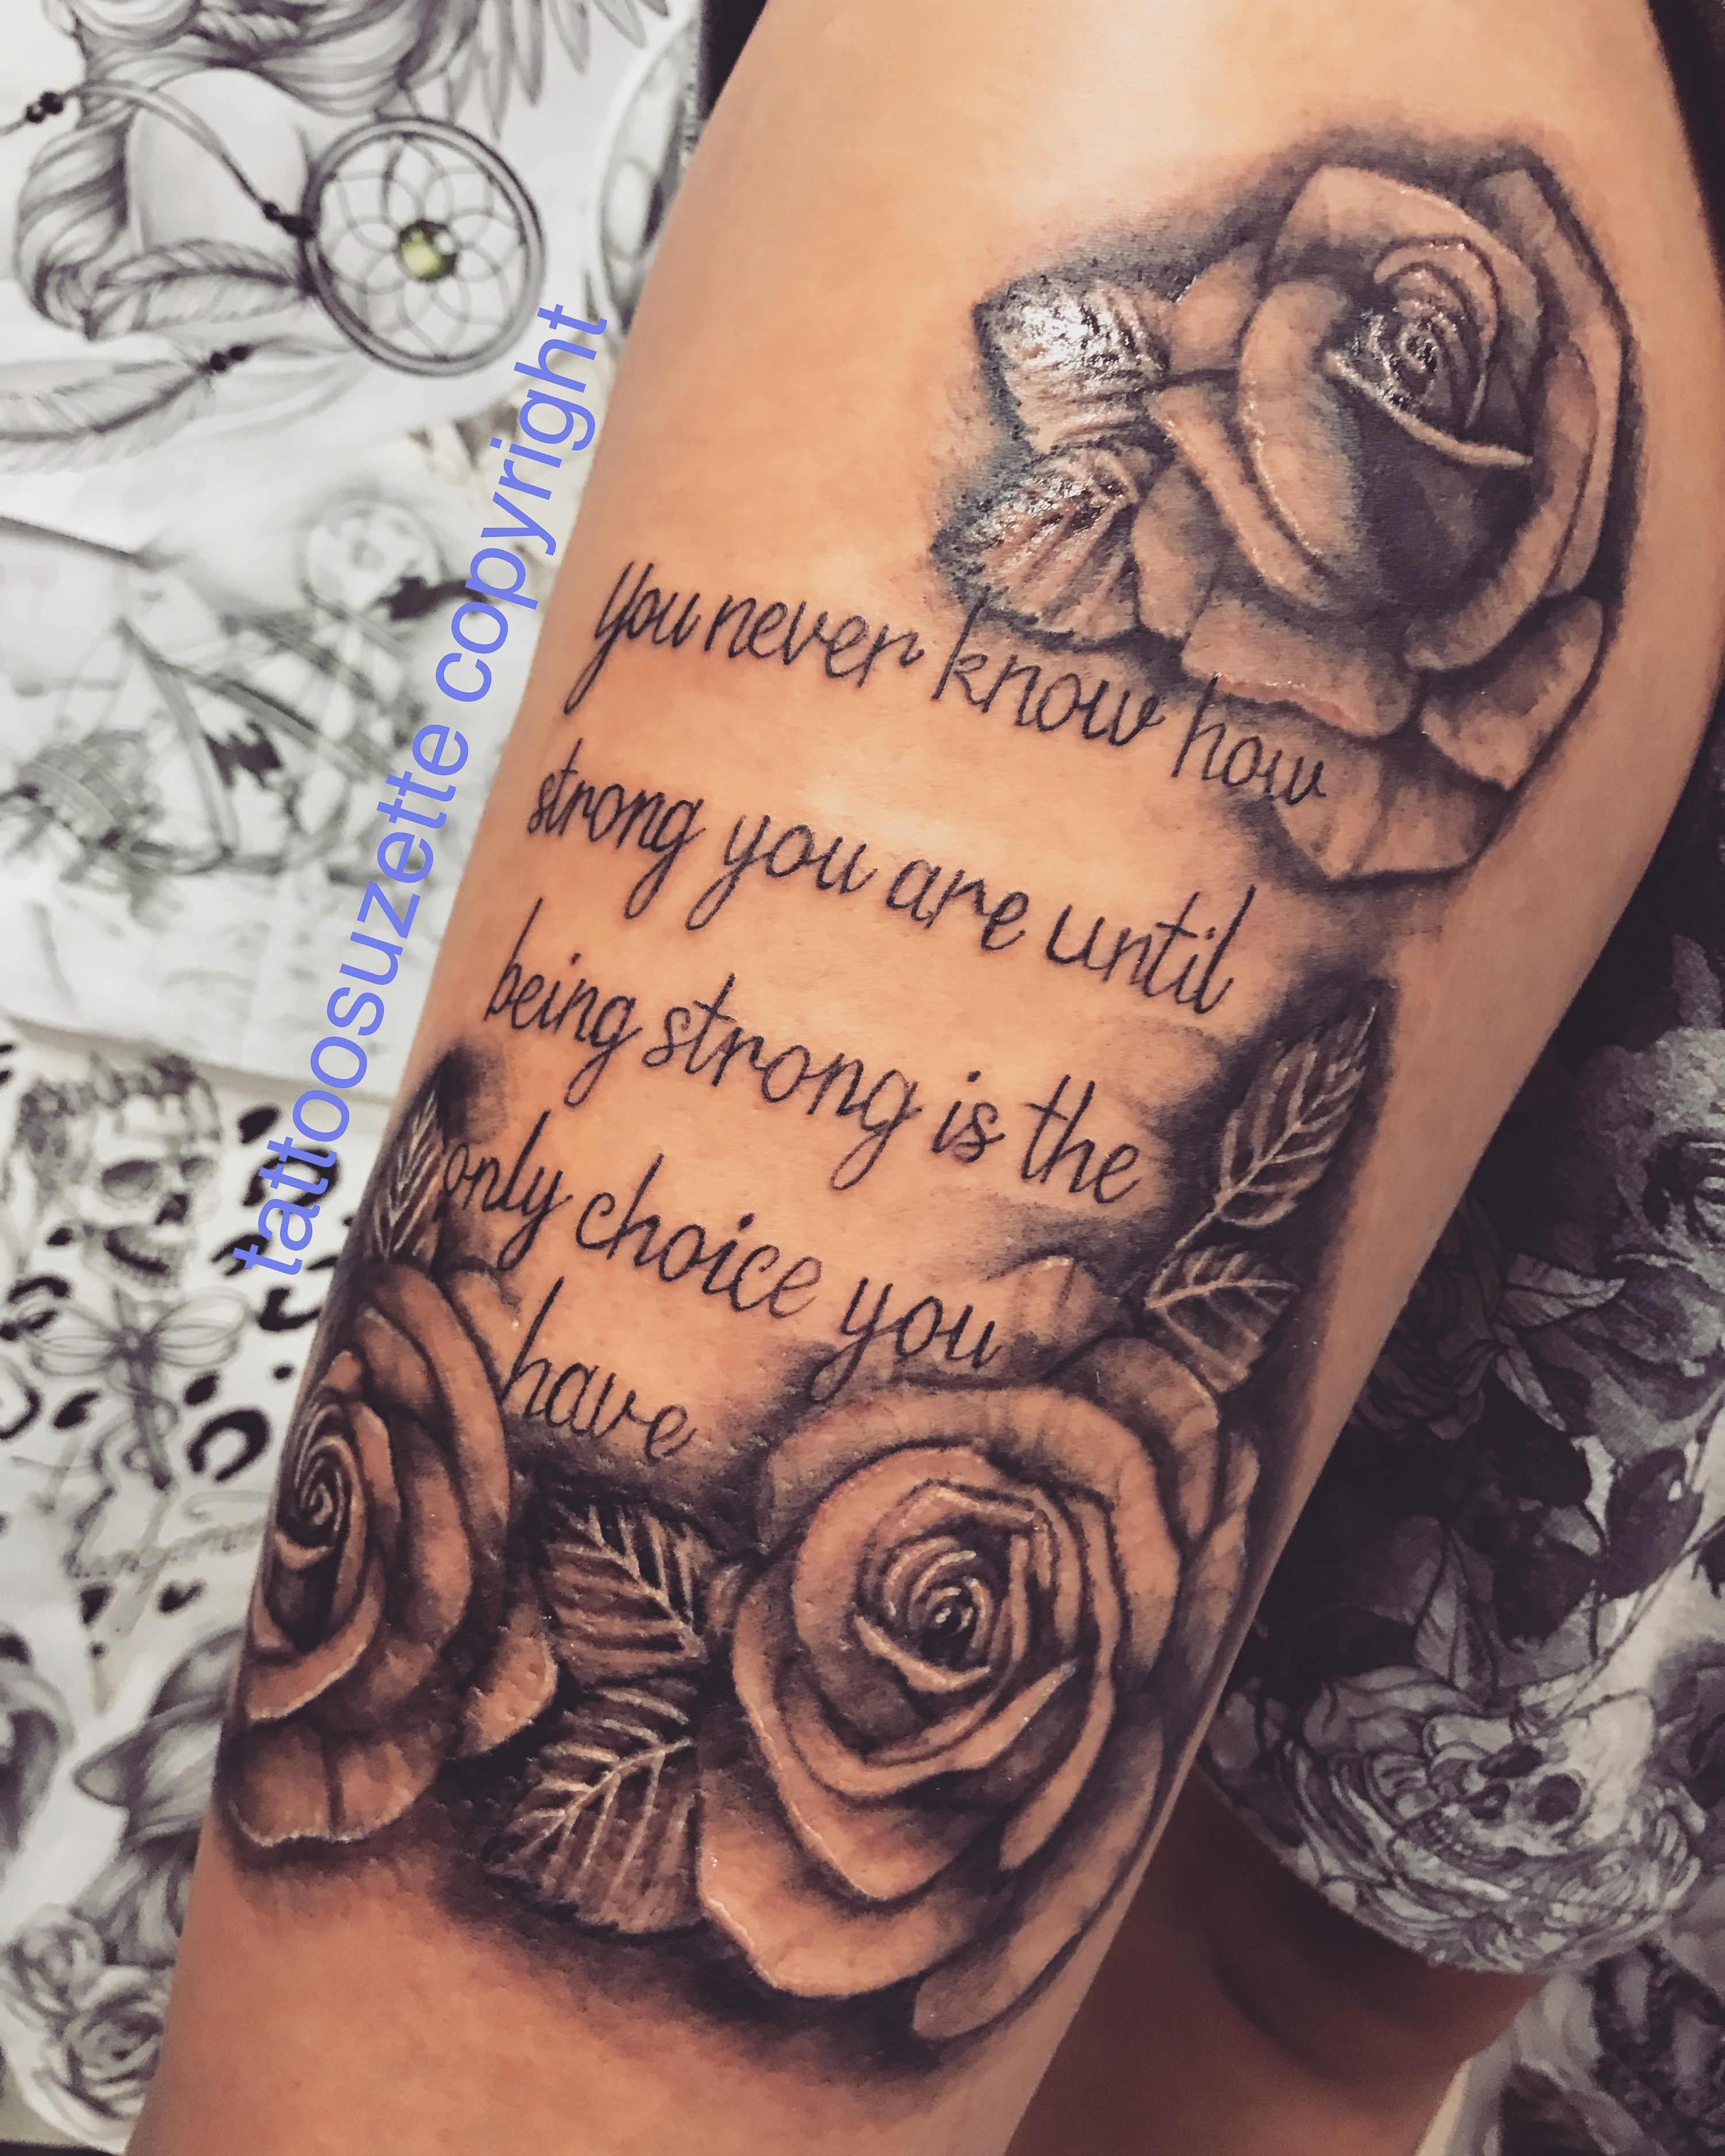 Thightattoo Tattoothigh Tatouagecuisse Cuissetatouage Tattoocuisse Cuissetattoo Rosetattoo T Tattoos For Women Arm Tattoos For Women Upper Thigh Tattoos Women